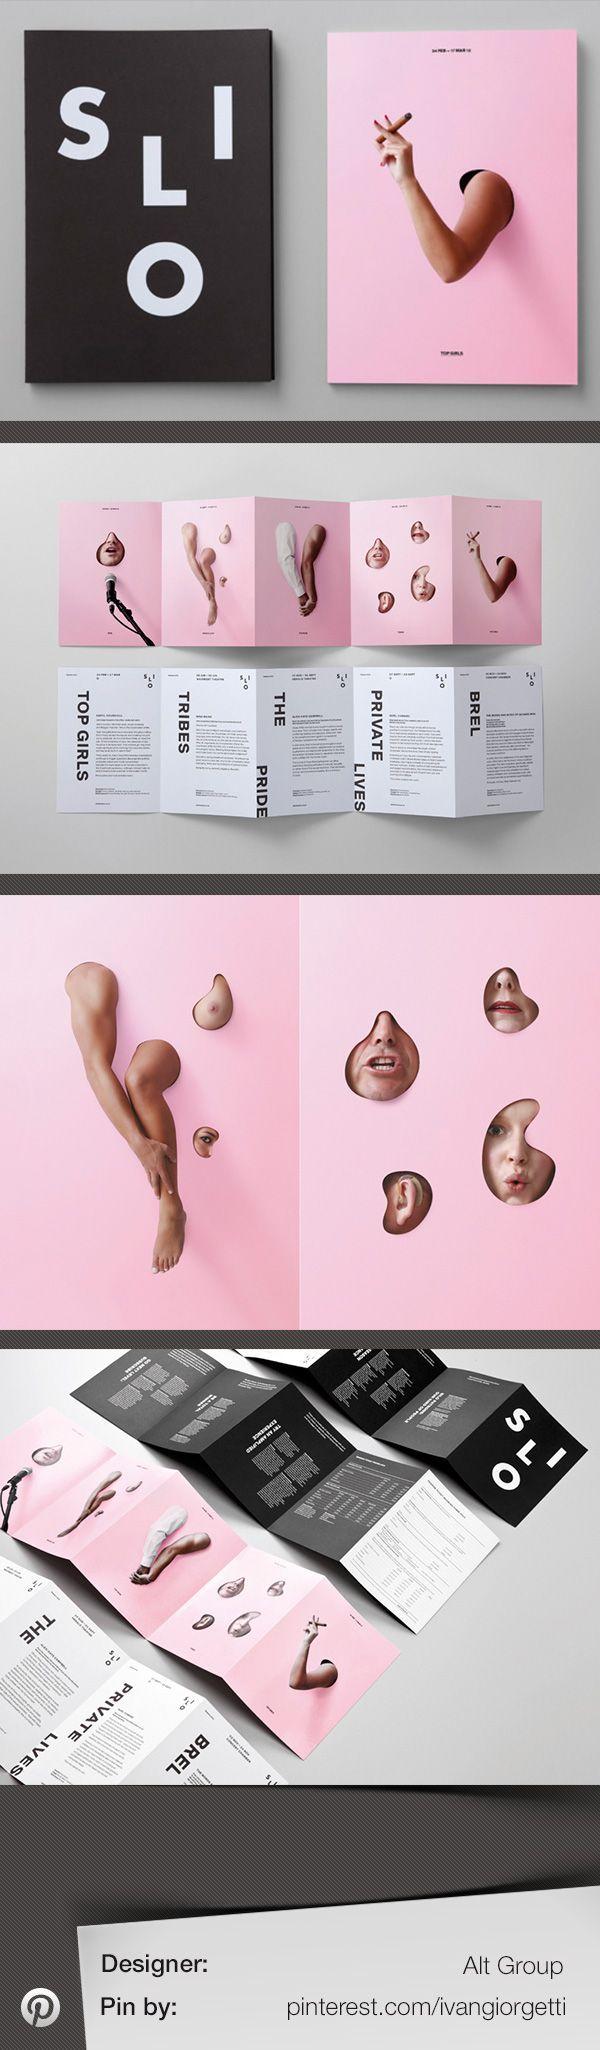 Best 25 Graphic Design Portfolios Ideas On Pinterest Portfolio Design Graphic Design